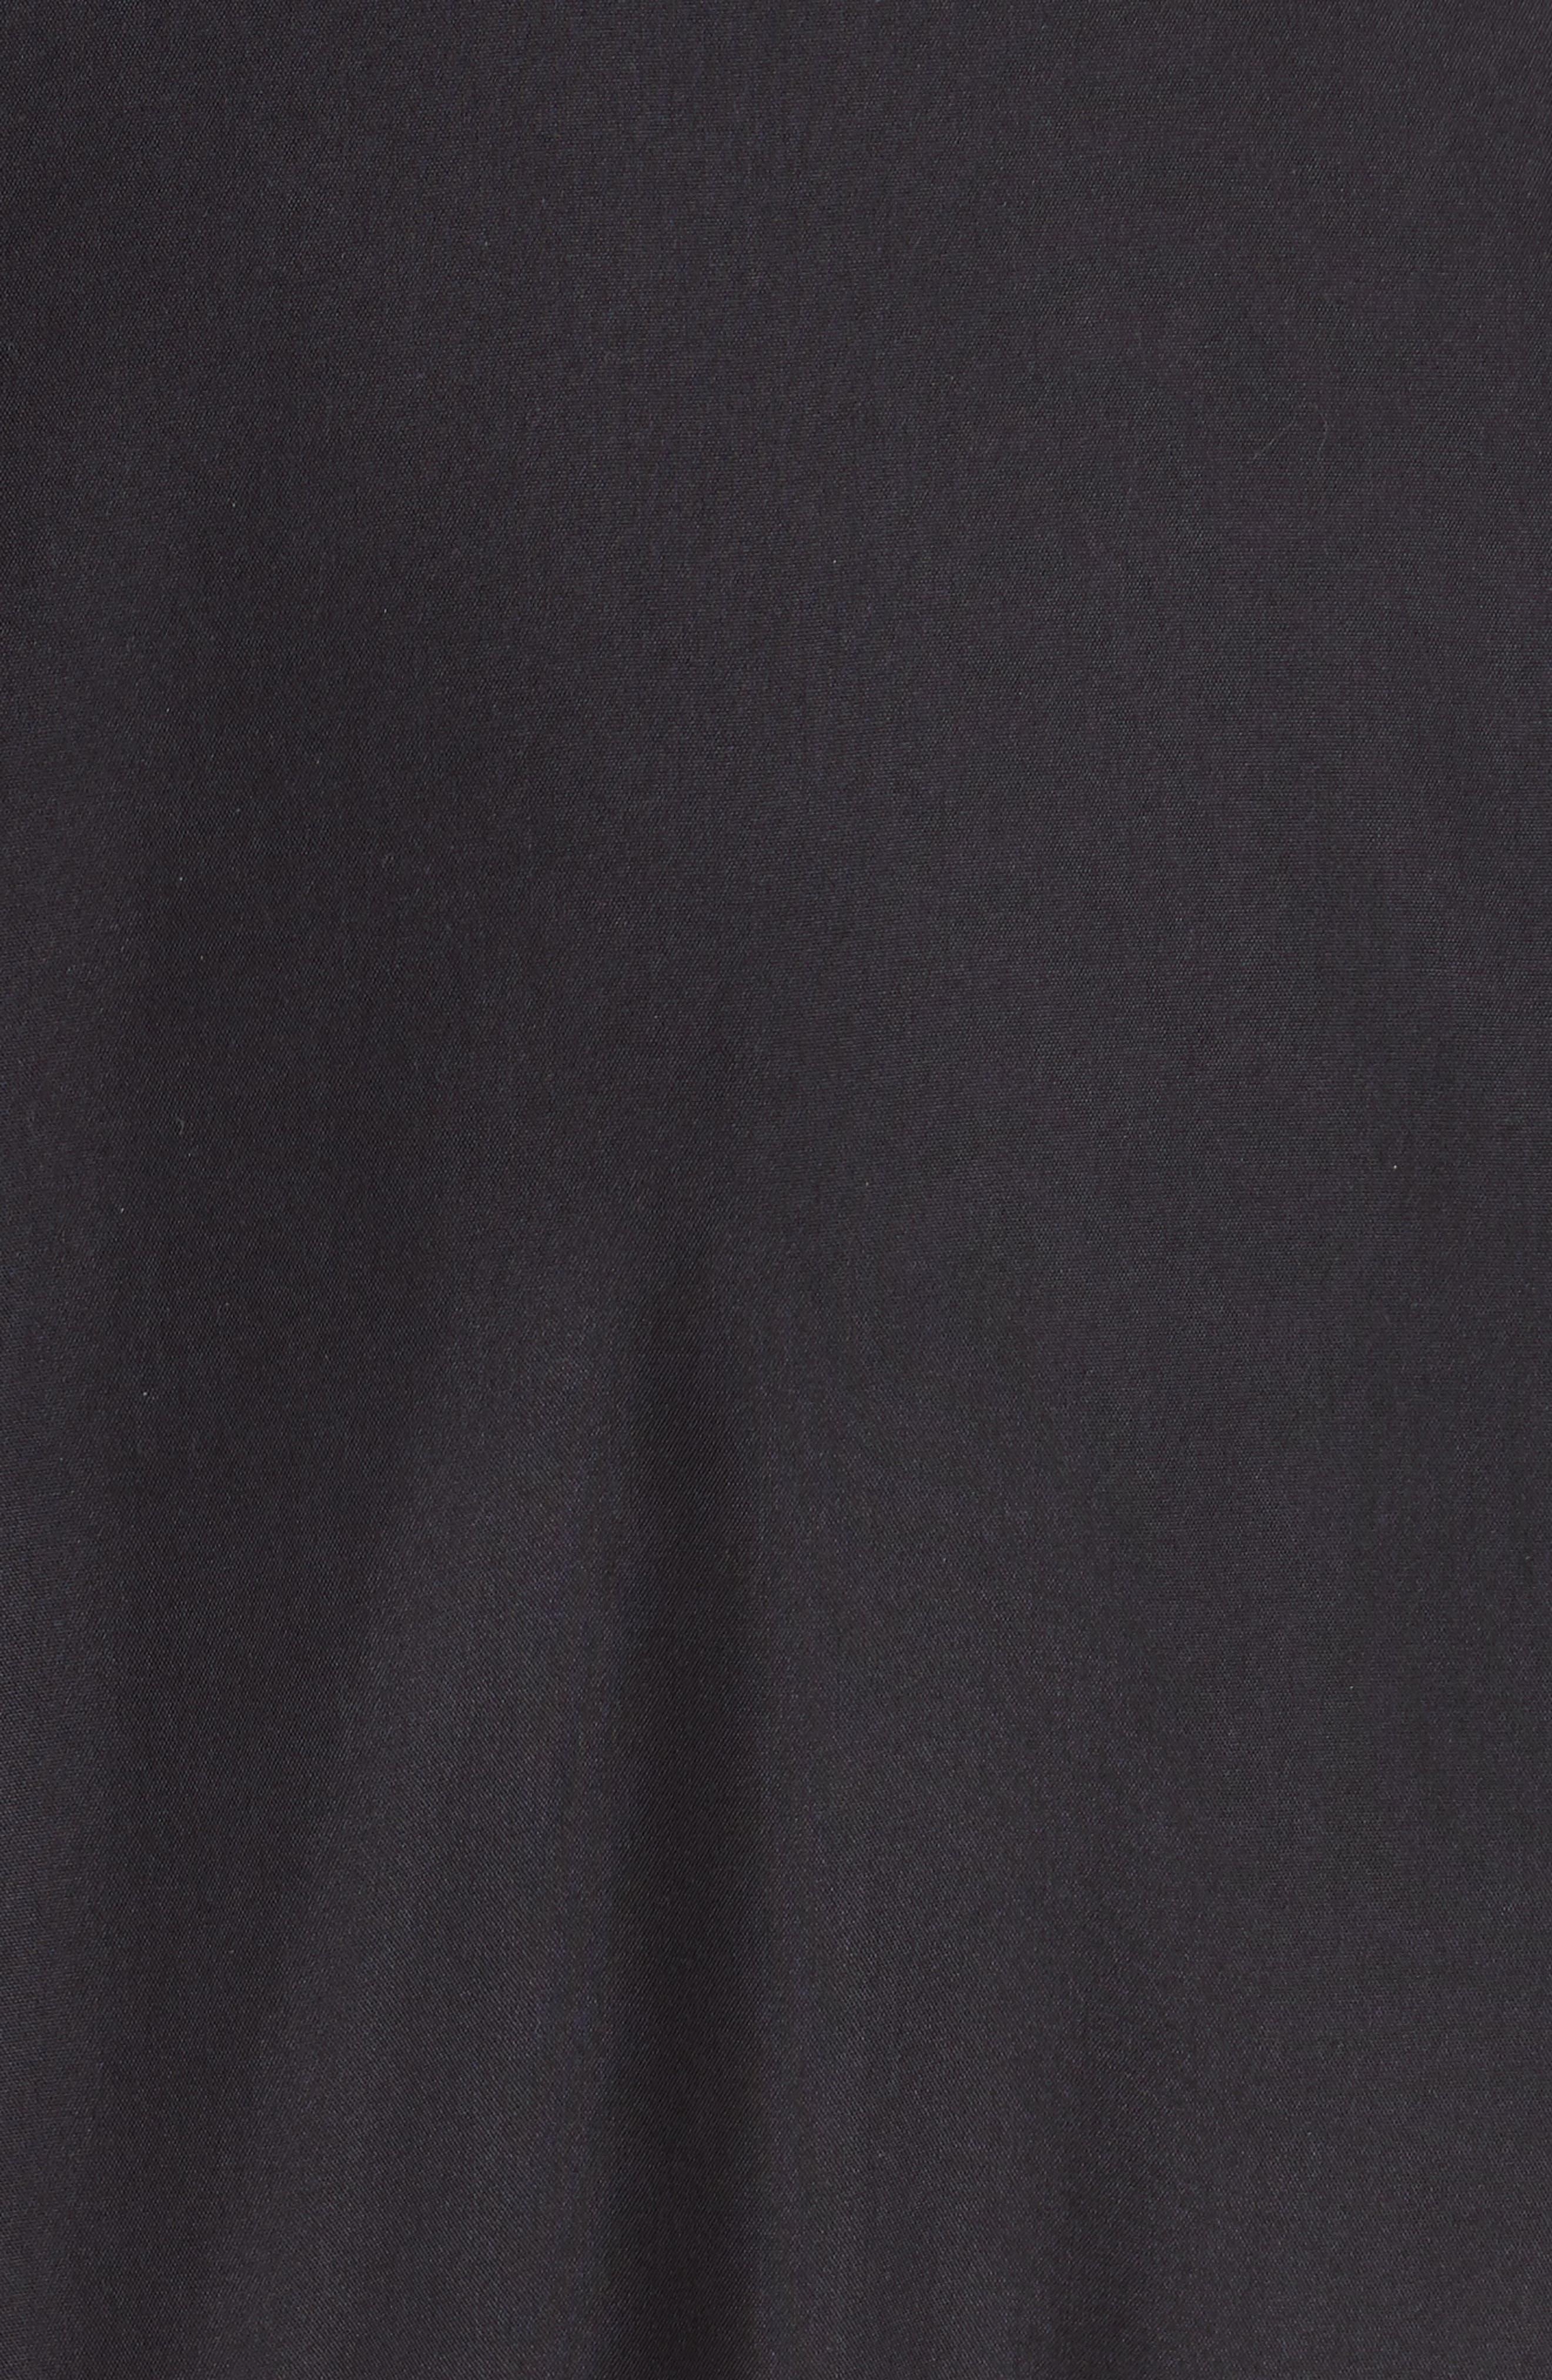 Garner Drop Shoulder Flounce Dress,                             Alternate thumbnail 5, color,                             001